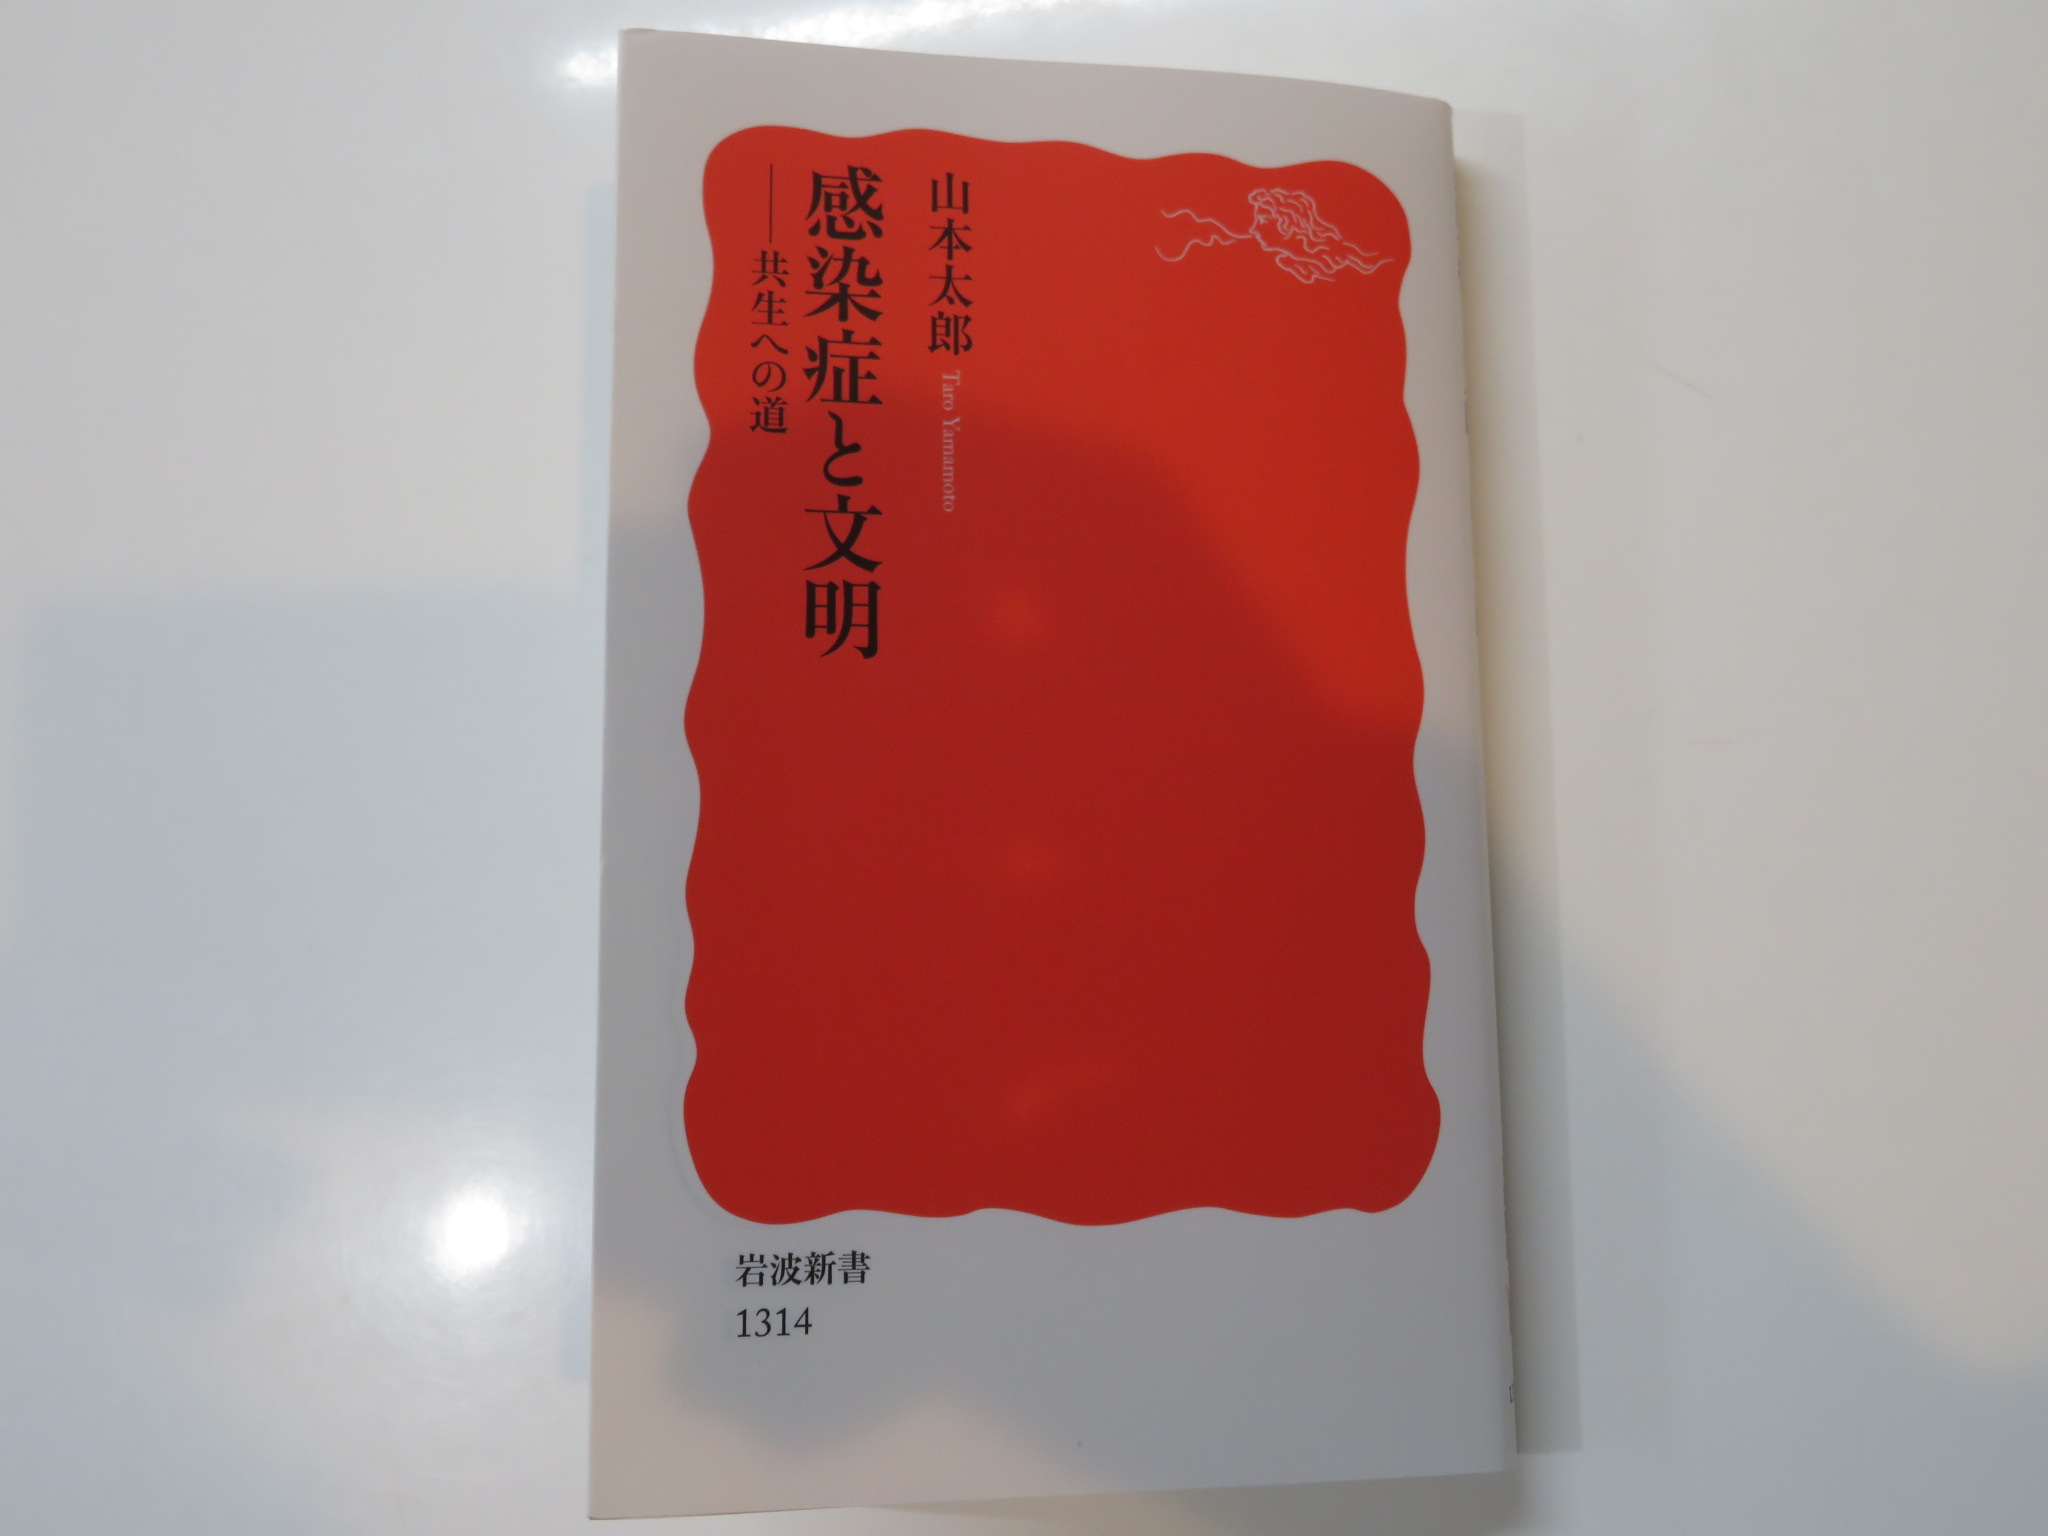 https://www.elashy-mise.jp/IMG_5745a.JPG